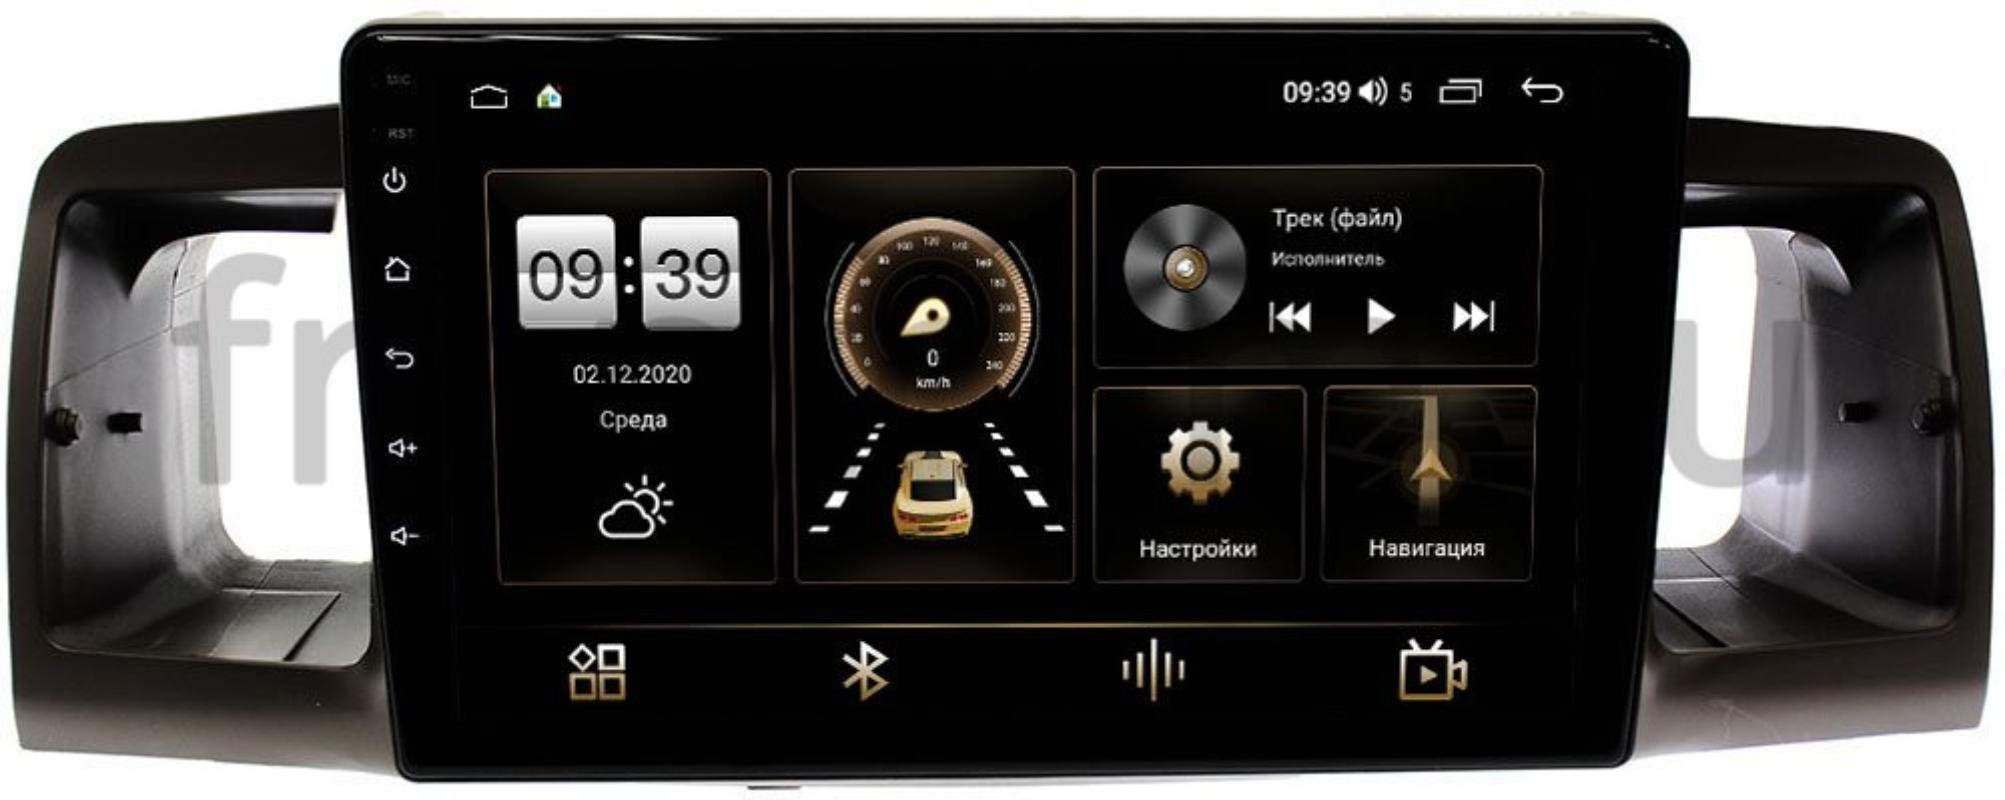 Штатная магнитола Toyota Corolla IX 2000-2007 LeTrun 3792-9074 на Android 10 (4/64, DSP, QLed) С оптическим выходом (+ Камера заднего вида в подарок!)